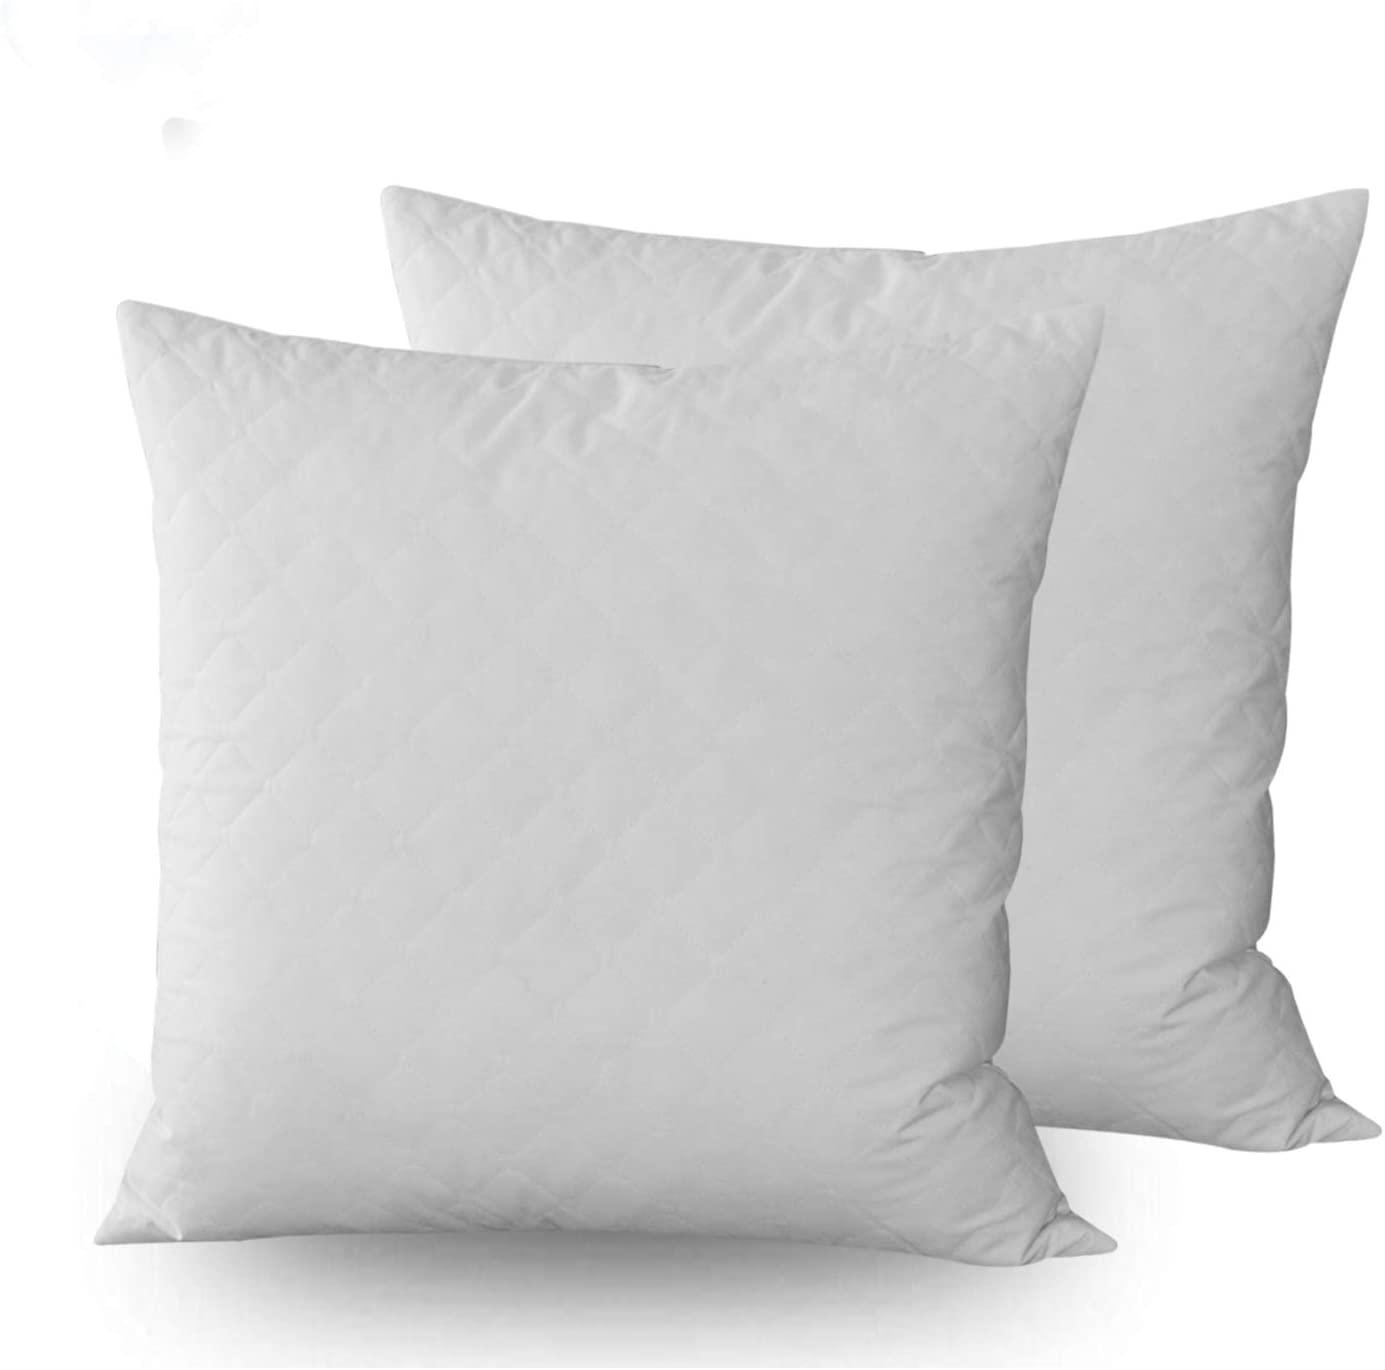 Dream High Premium Goose Down Feather Throw Pillow Inserts(Set of 2)-100% Cotton Cover, Square,Luxury Soft Plush,Premium Stuffer Down,Machine Wash,Cushion (24x24)